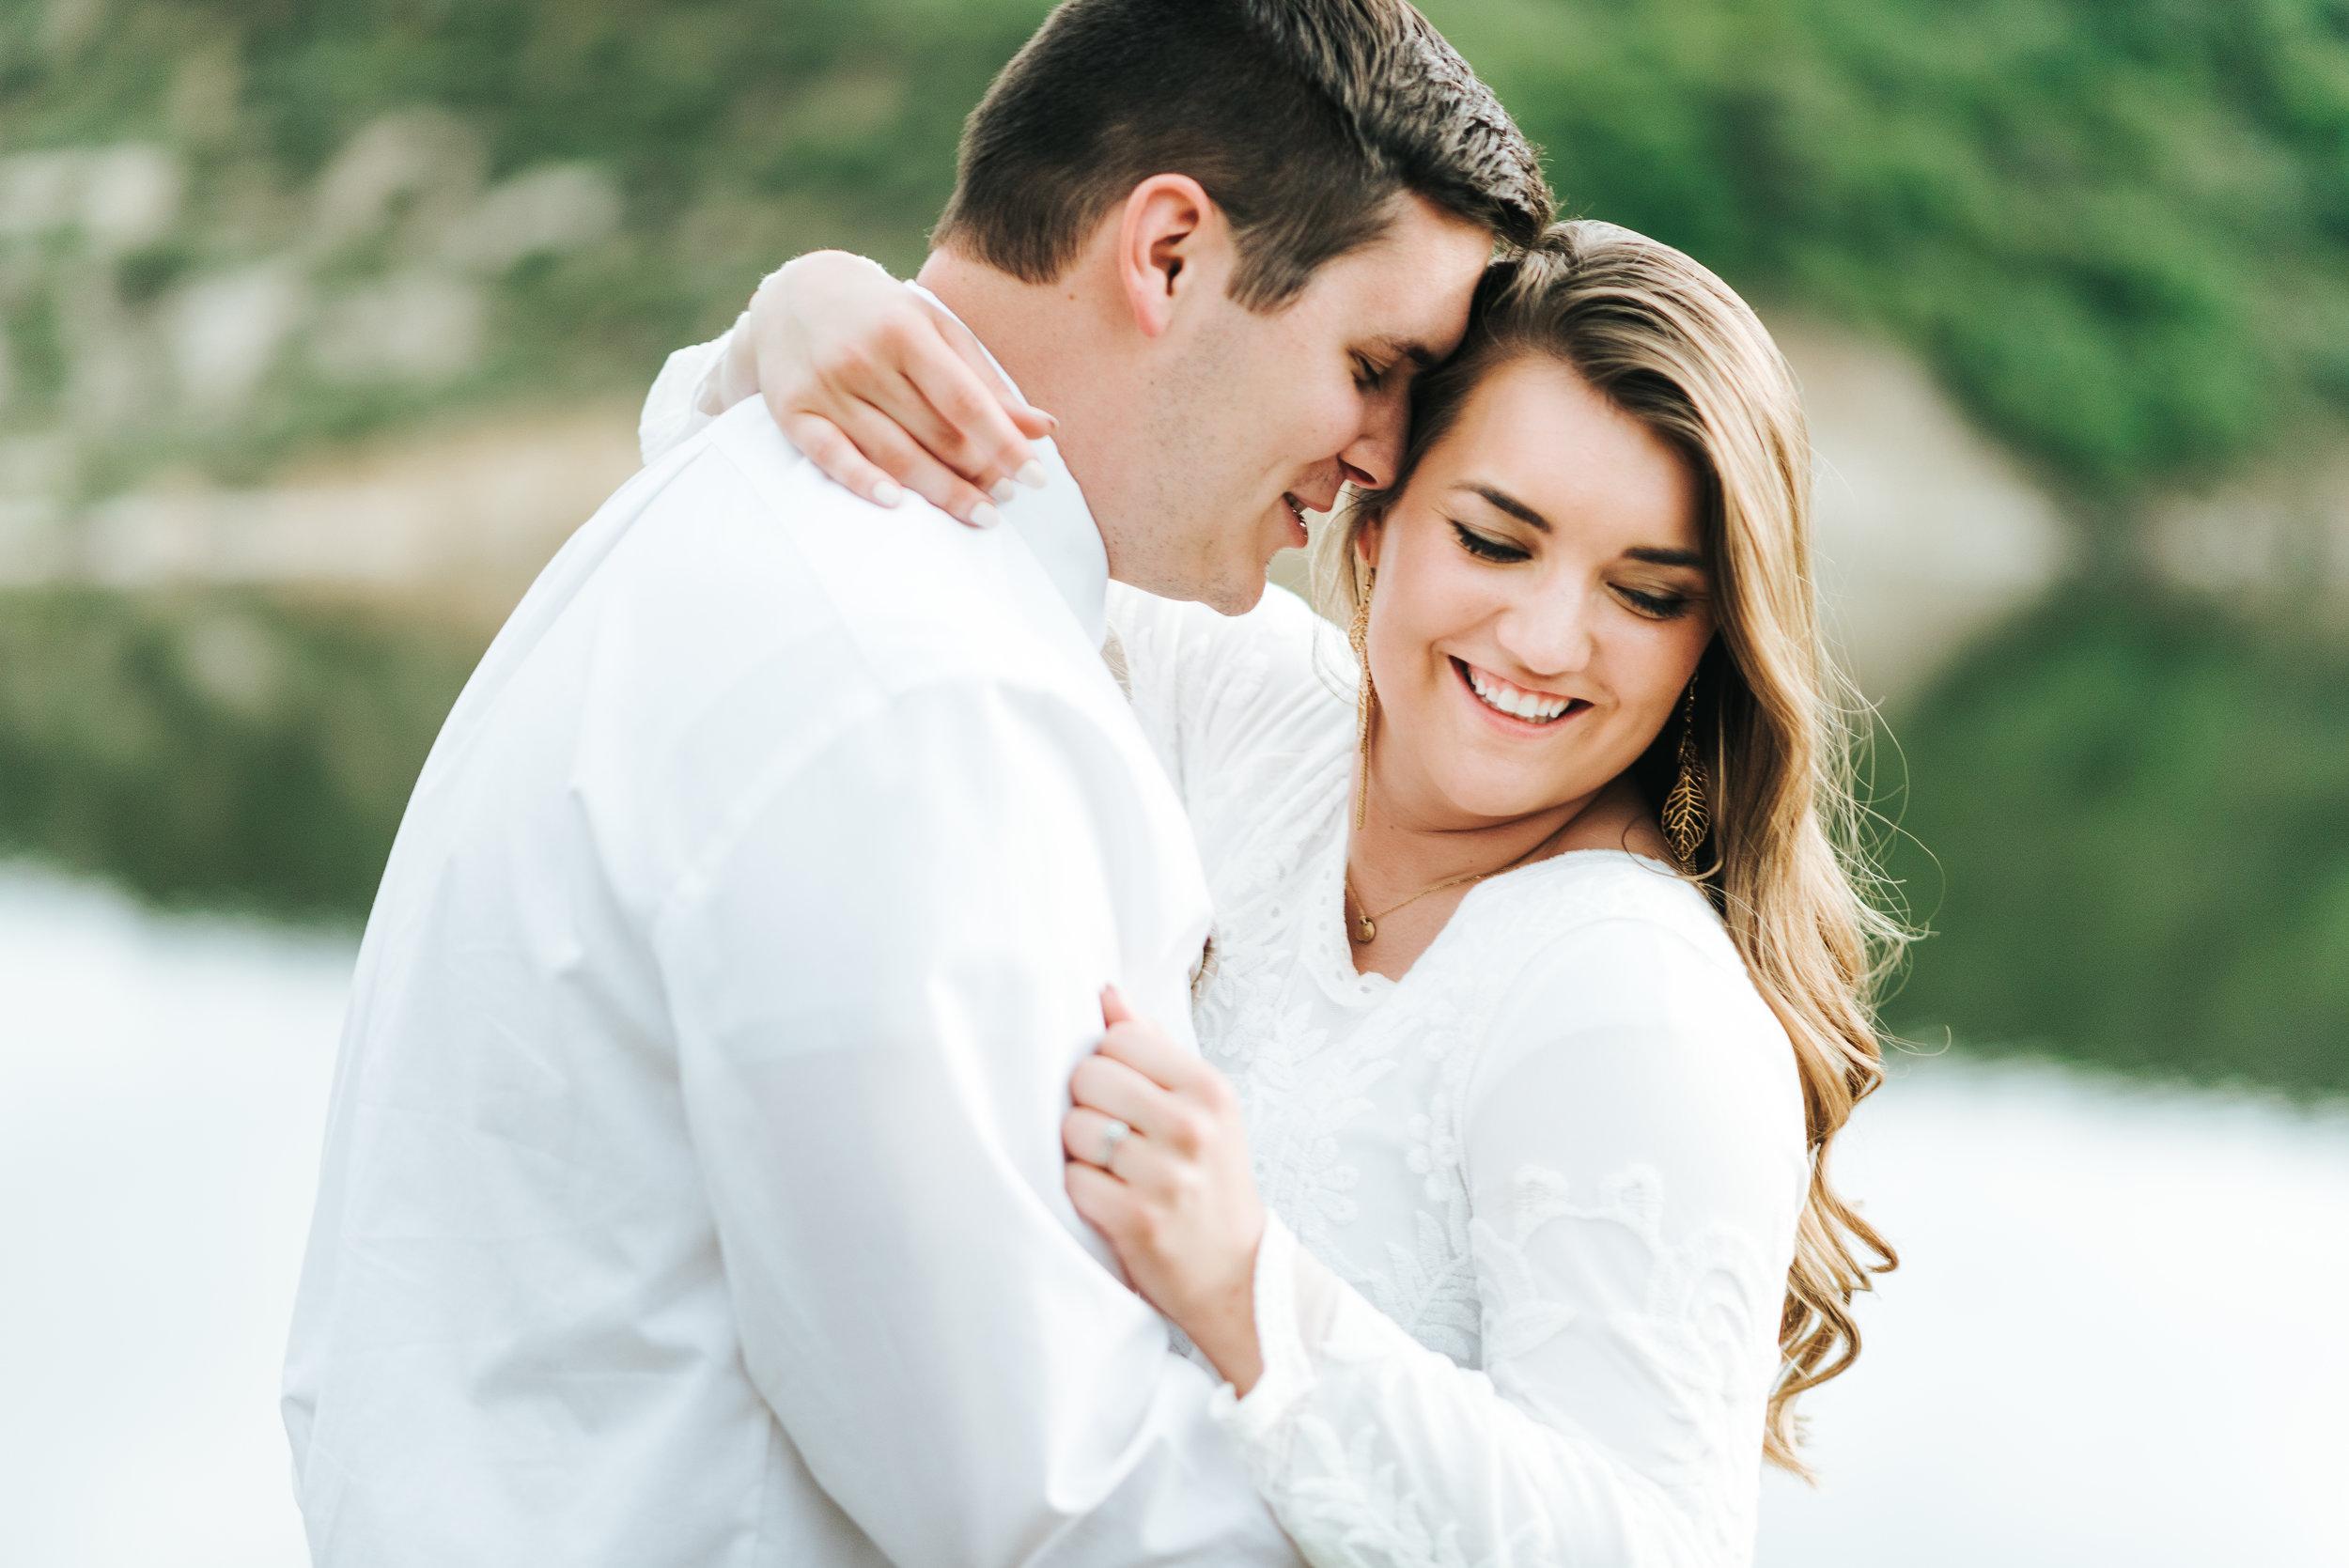 boise-boho-couples-photographer-10.jpg